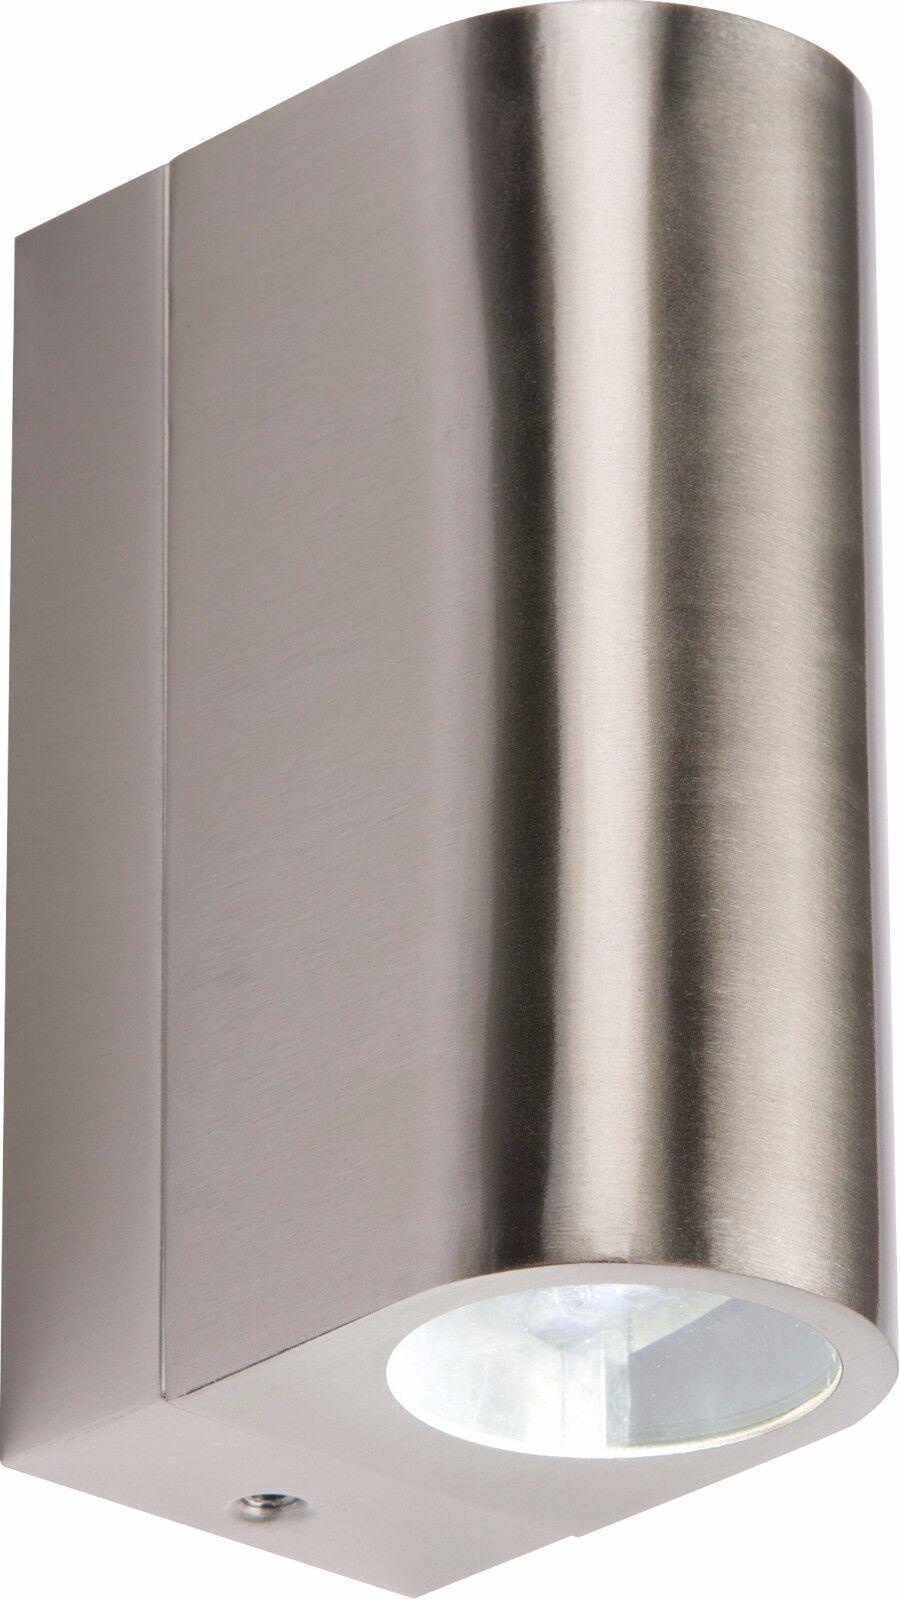 Knightsbridge Ip44 230v 6w Tubular LED Arriba y Abajo Luz Interior o Exterior